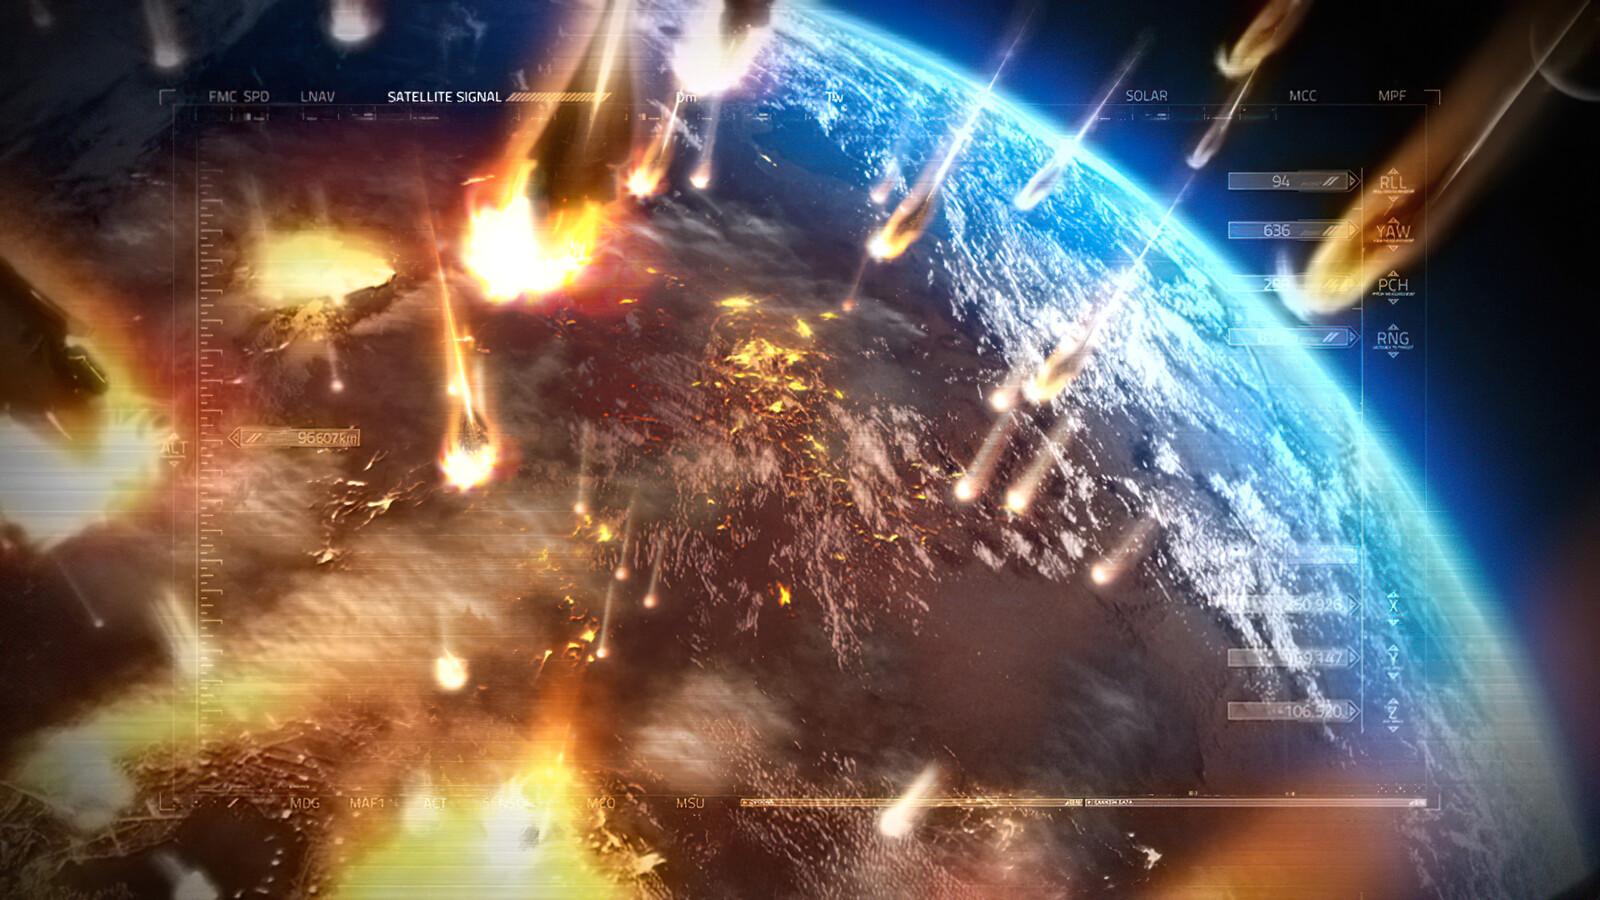 Mass Effect III - E3 Promo - (2012)